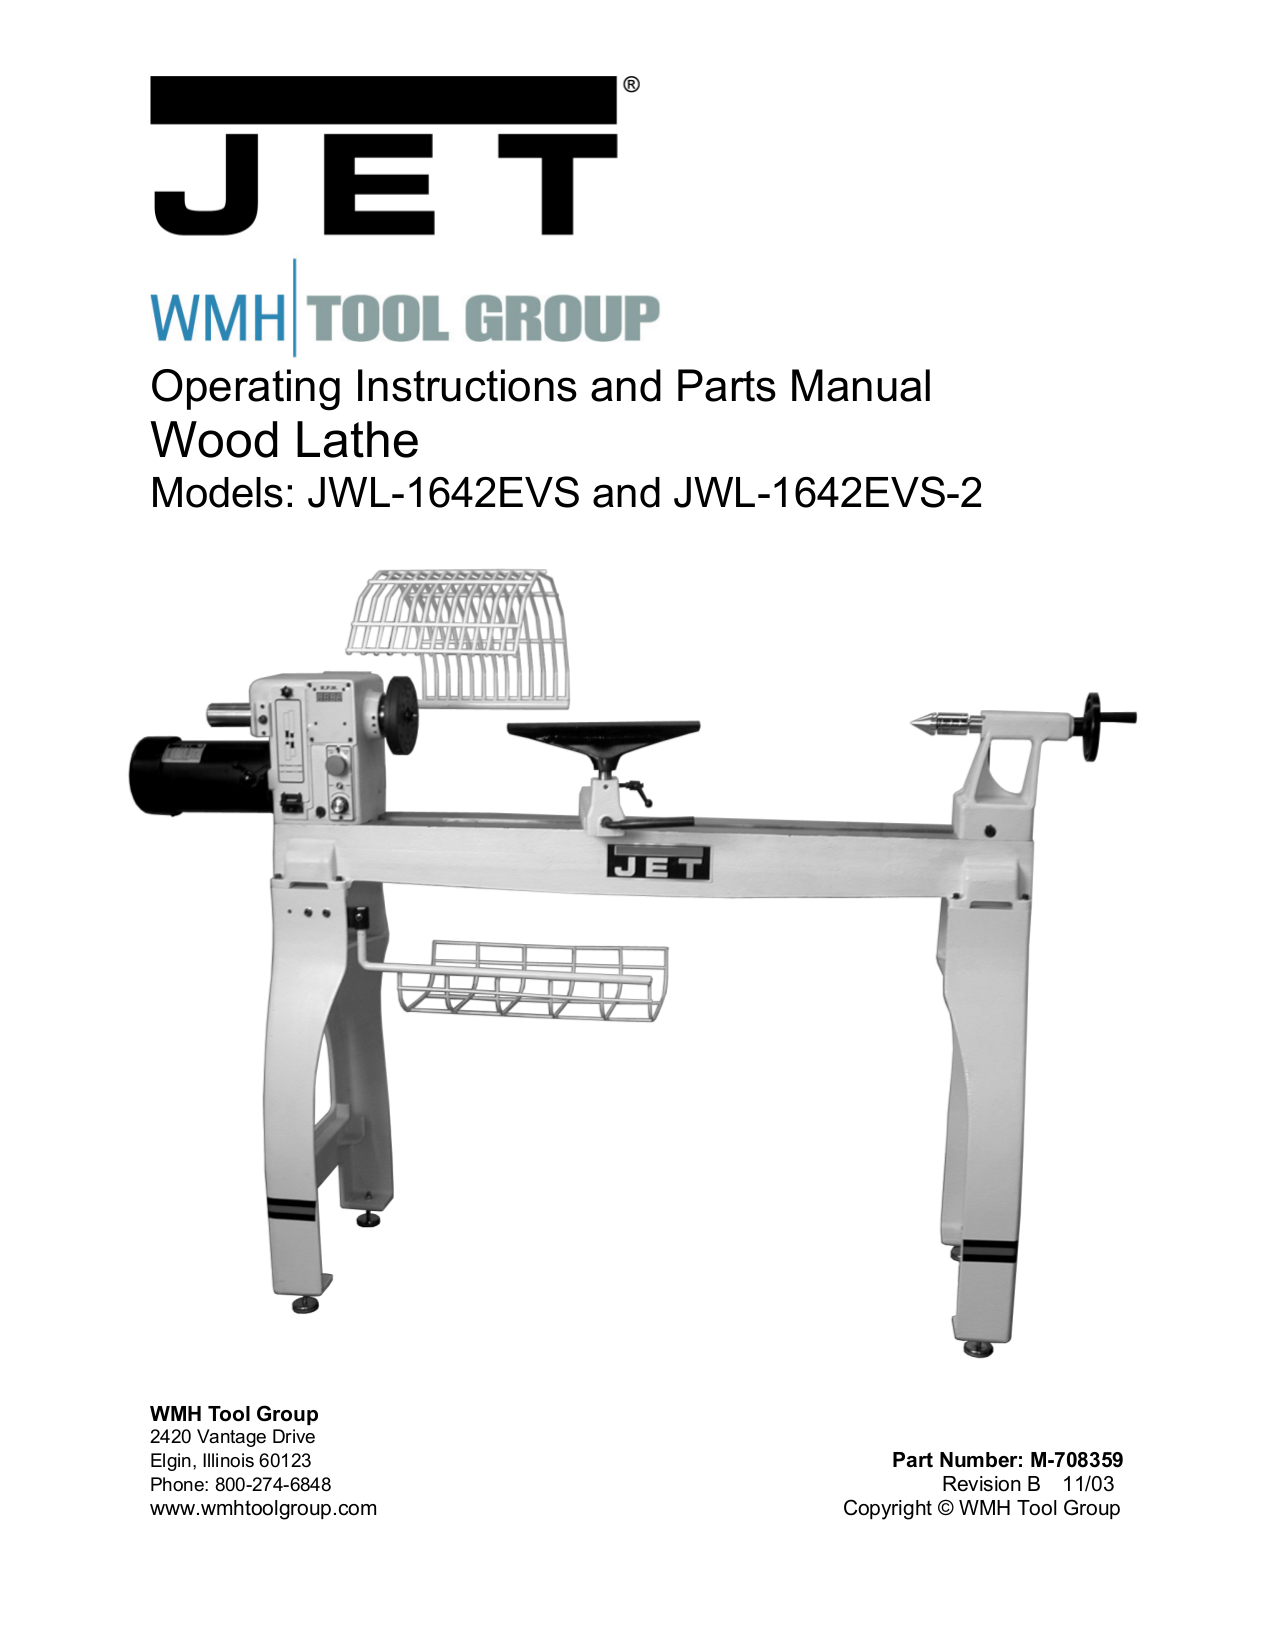 Lathe machine Main Parts Operation and Working